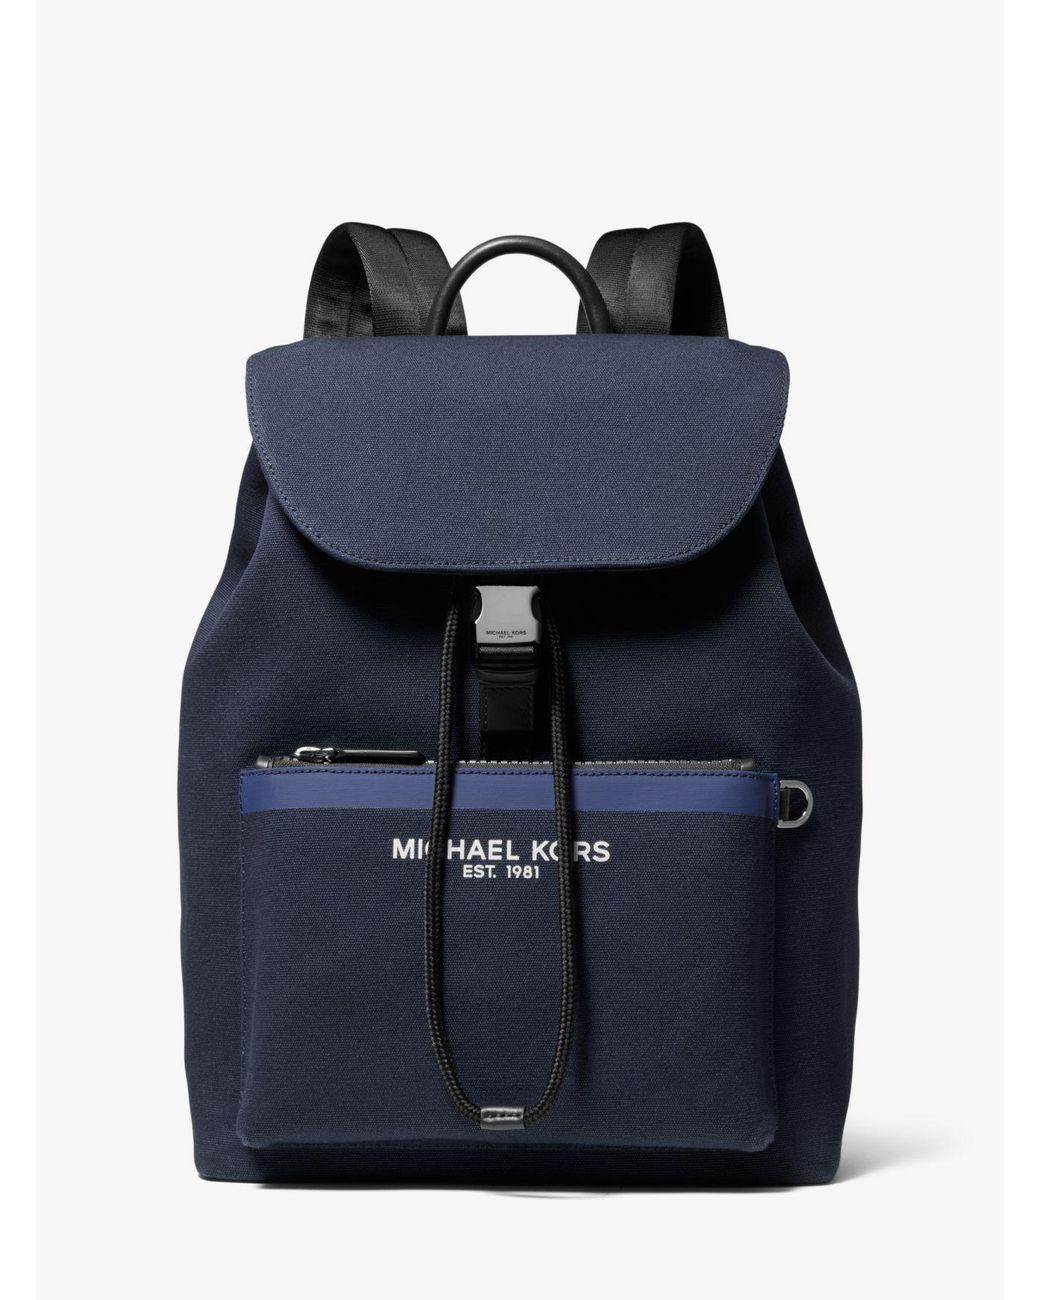 1ffd4c9e89de Lyst - Michael Kors Greyson Canvas Backpack in Blue for Men